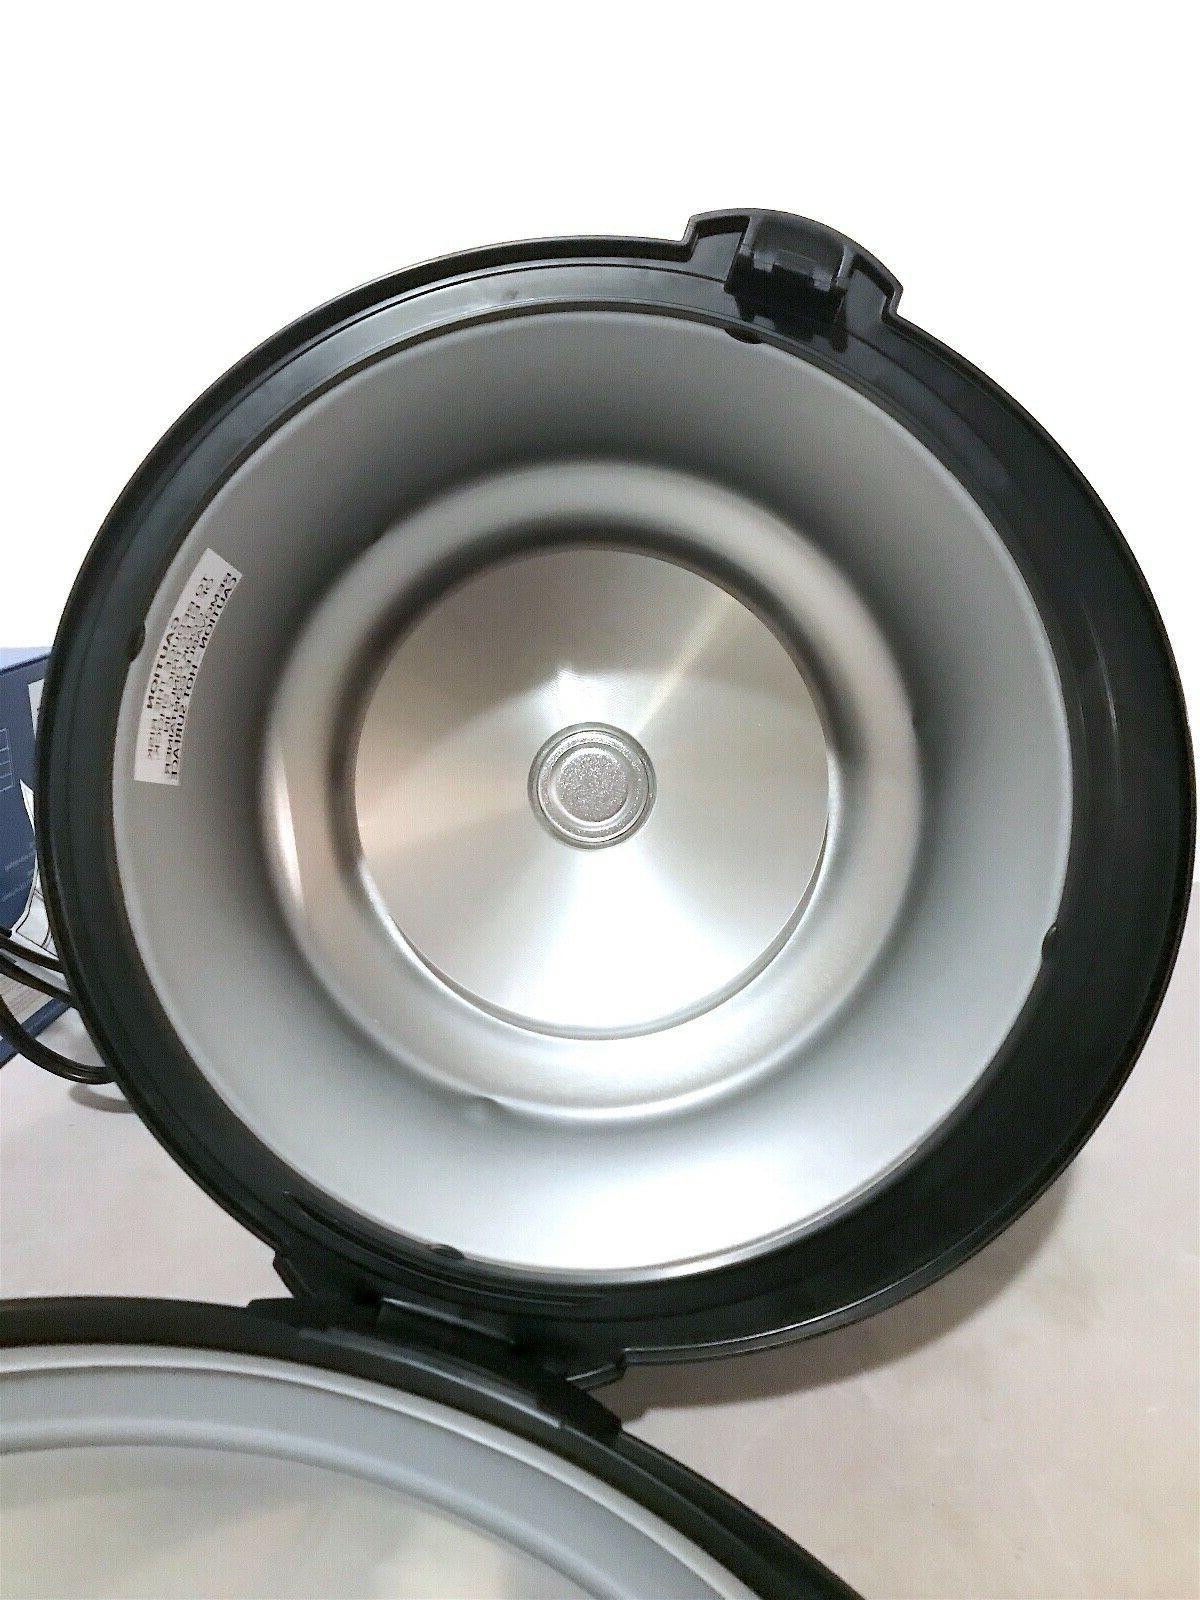 AROMA 20 Cup Quart Rice Steamer - ARC-1040SB